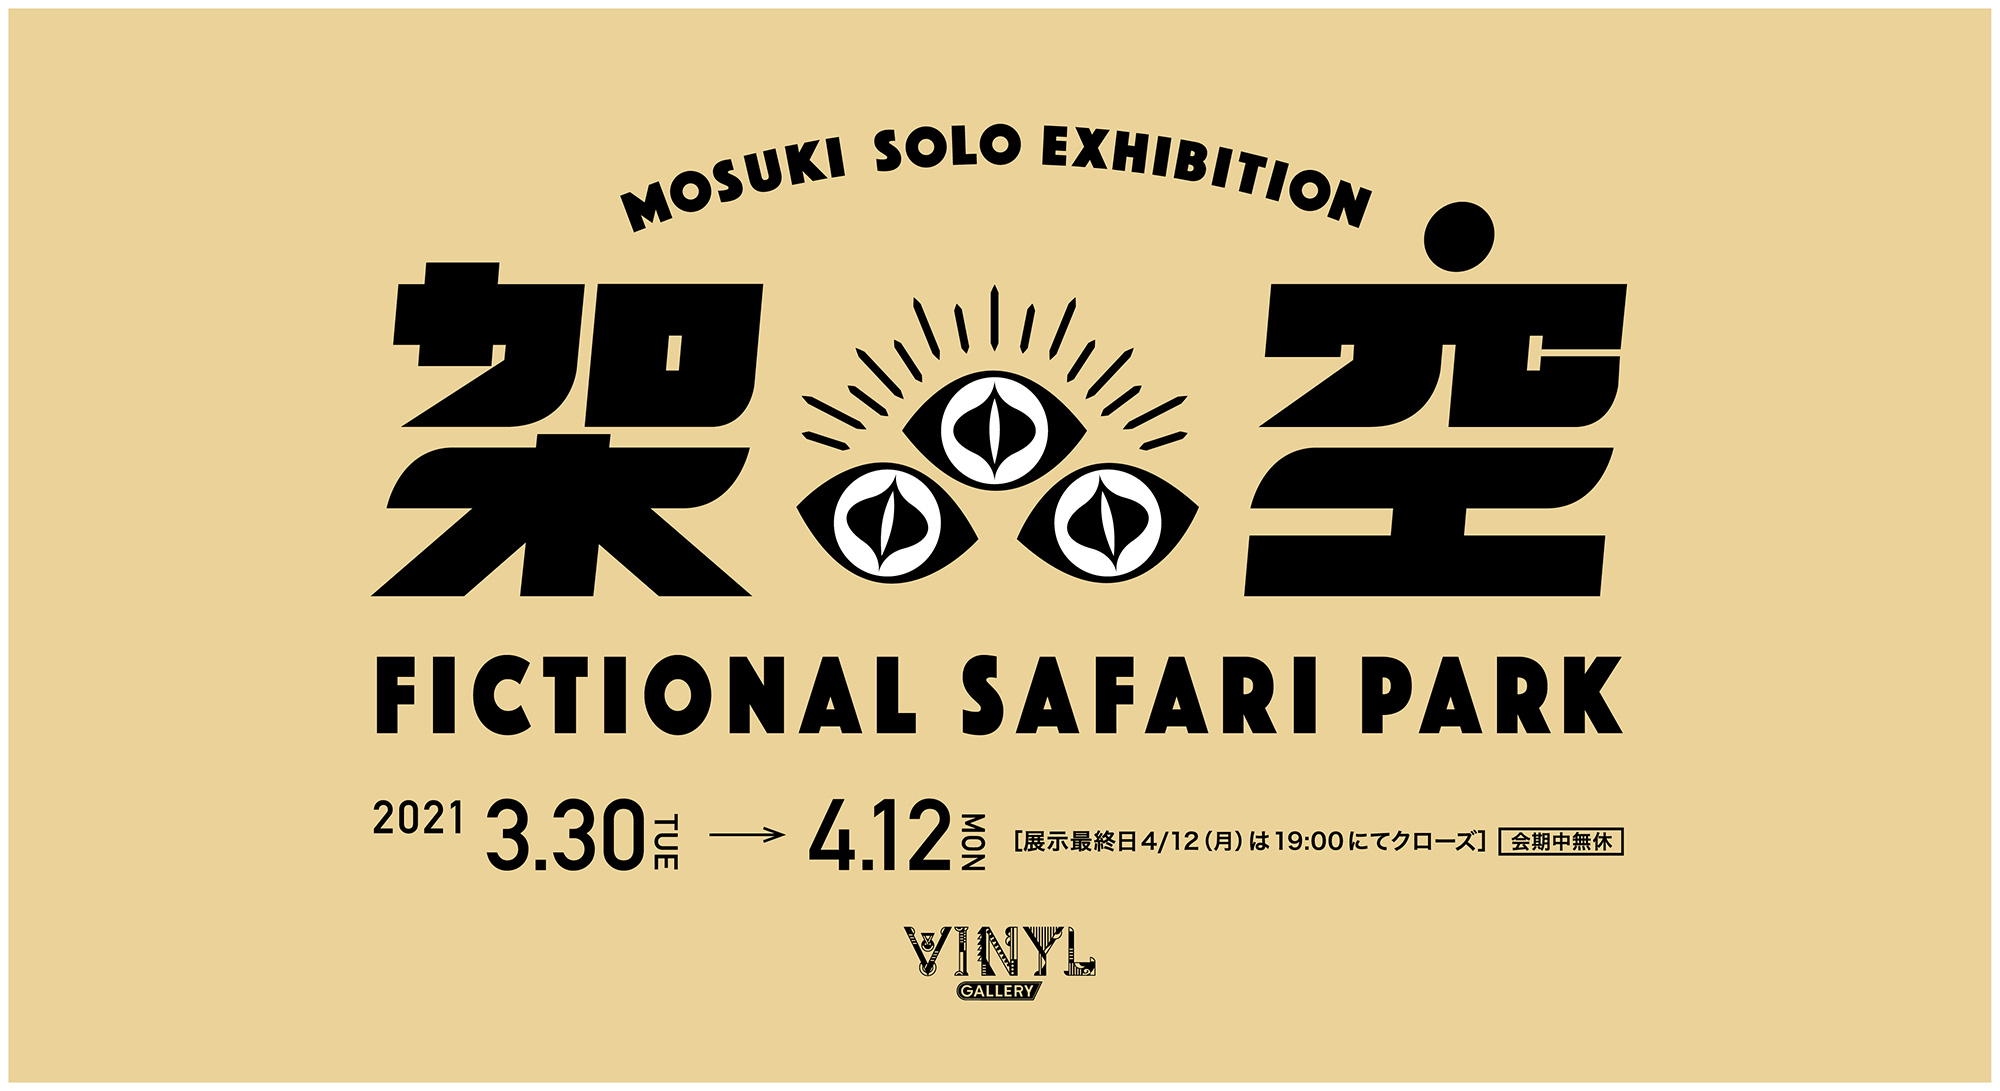 VINYL SHOWCASE MOSUKI Solo Exhibition <架空サファリパーク>